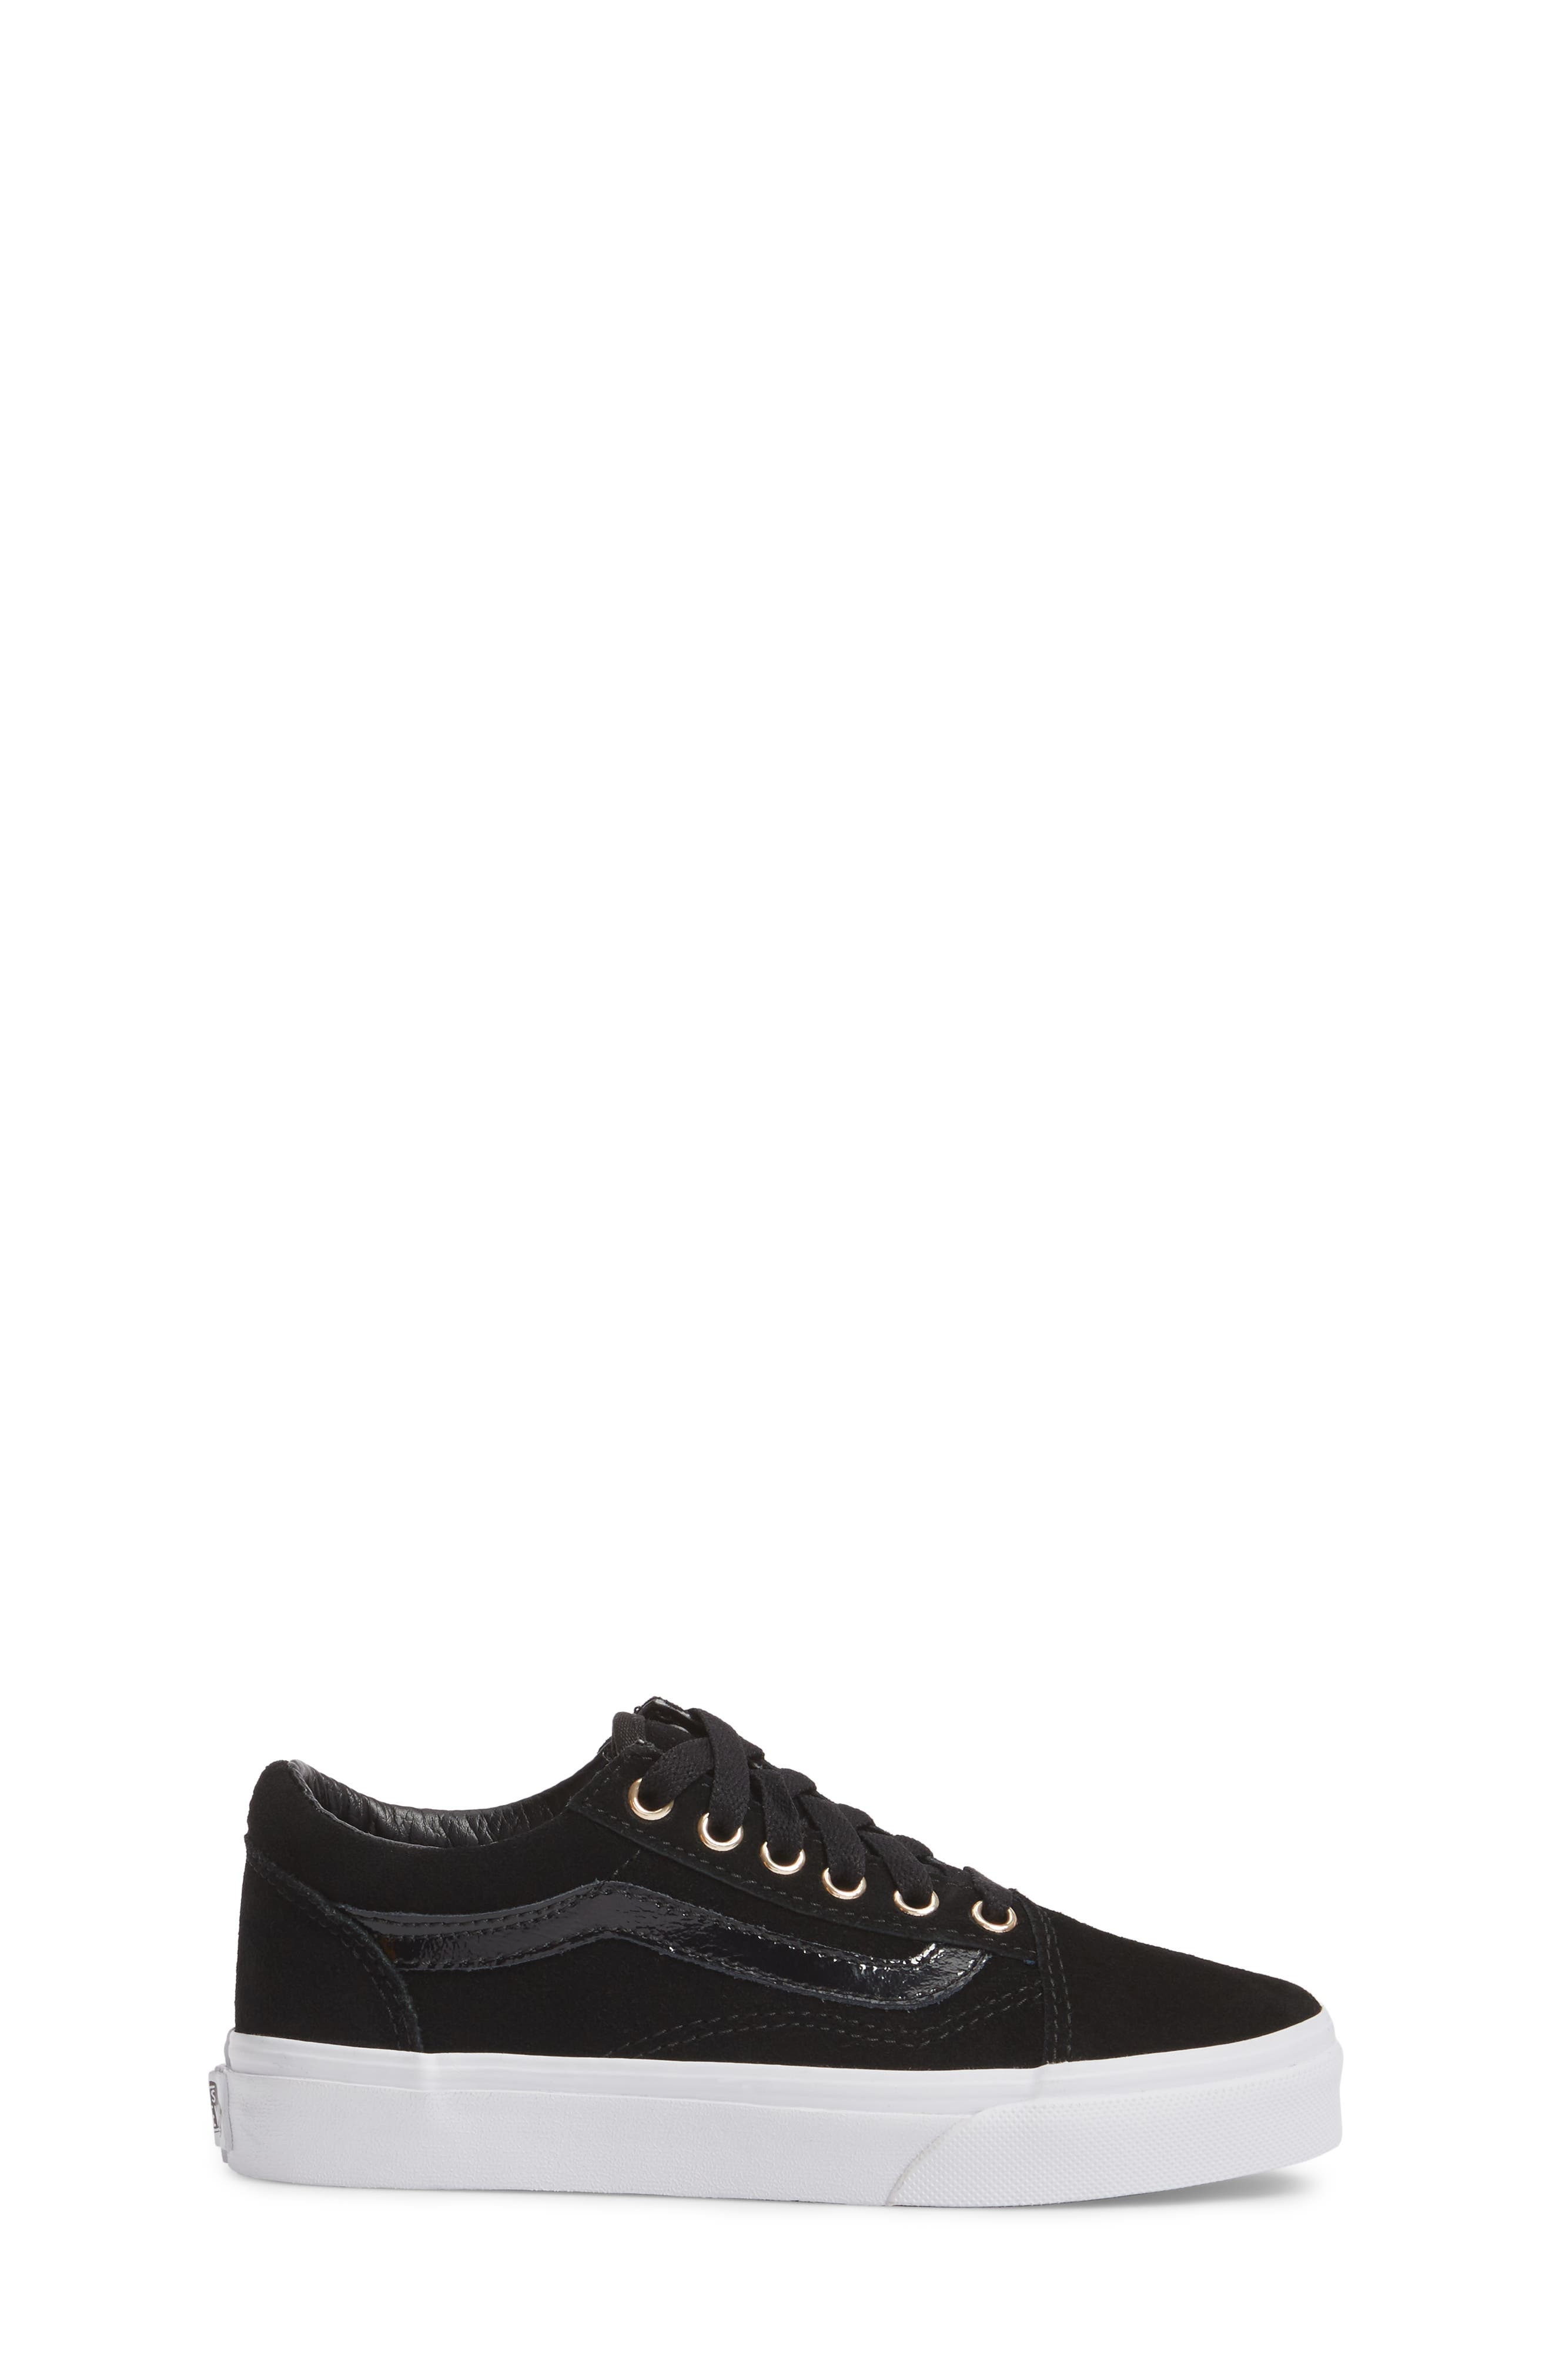 Old Skool Sneaker,                             Alternate thumbnail 3, color,                             Black/ Gold